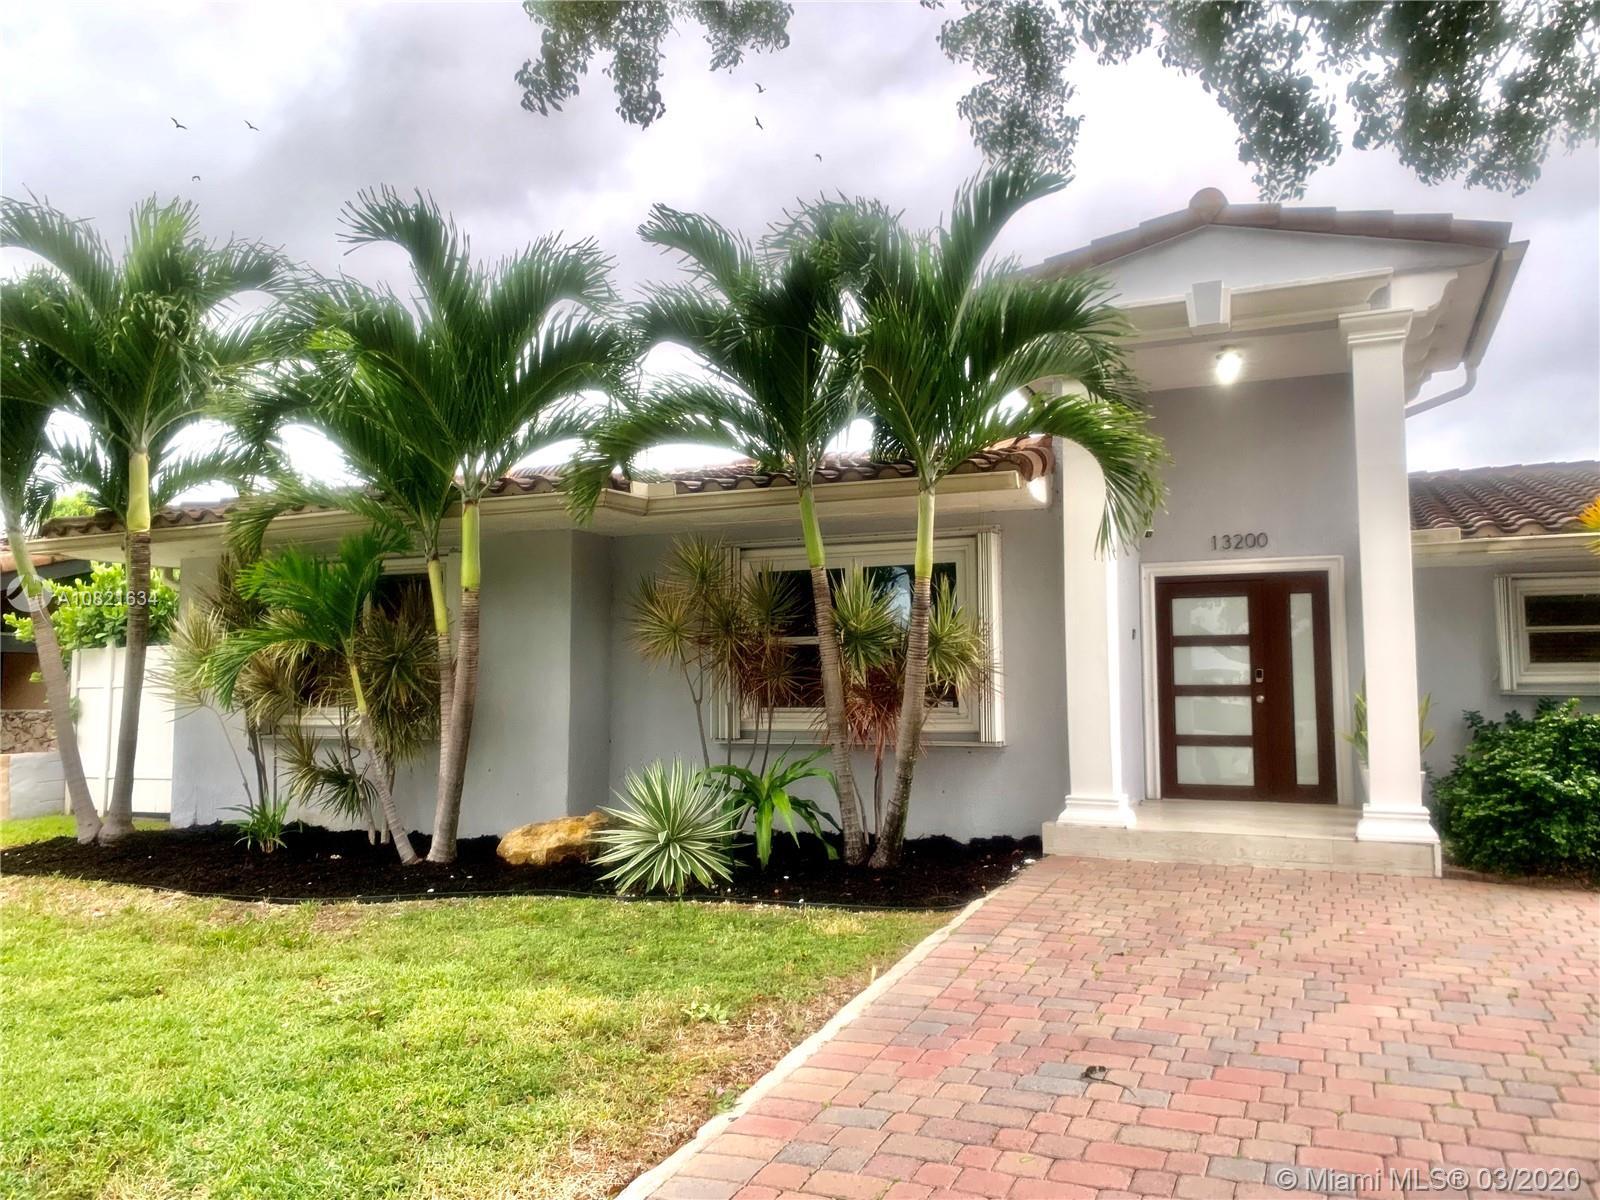 13200 N Bayshore Dr Property Photo - North Miami, FL real estate listing